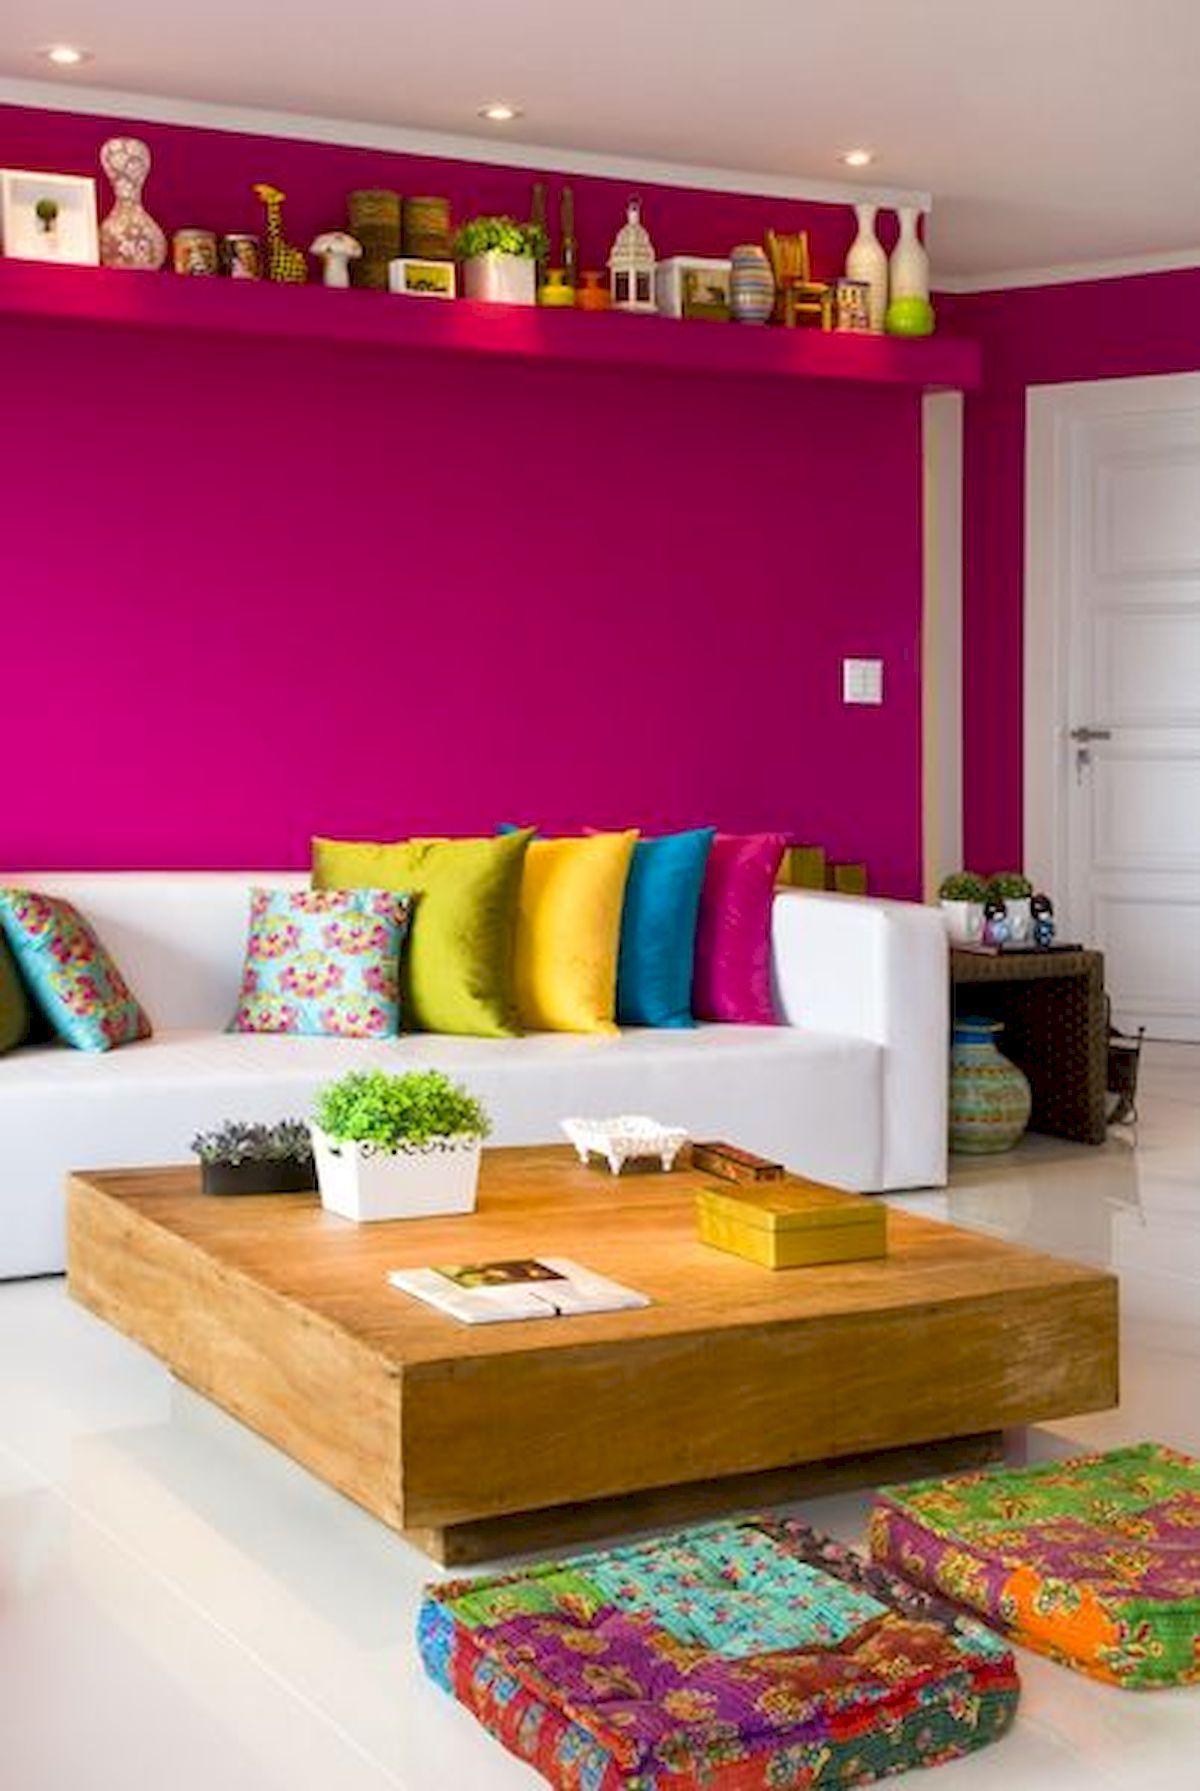 70 Fantastic Summer Living Room Decor Ideas images